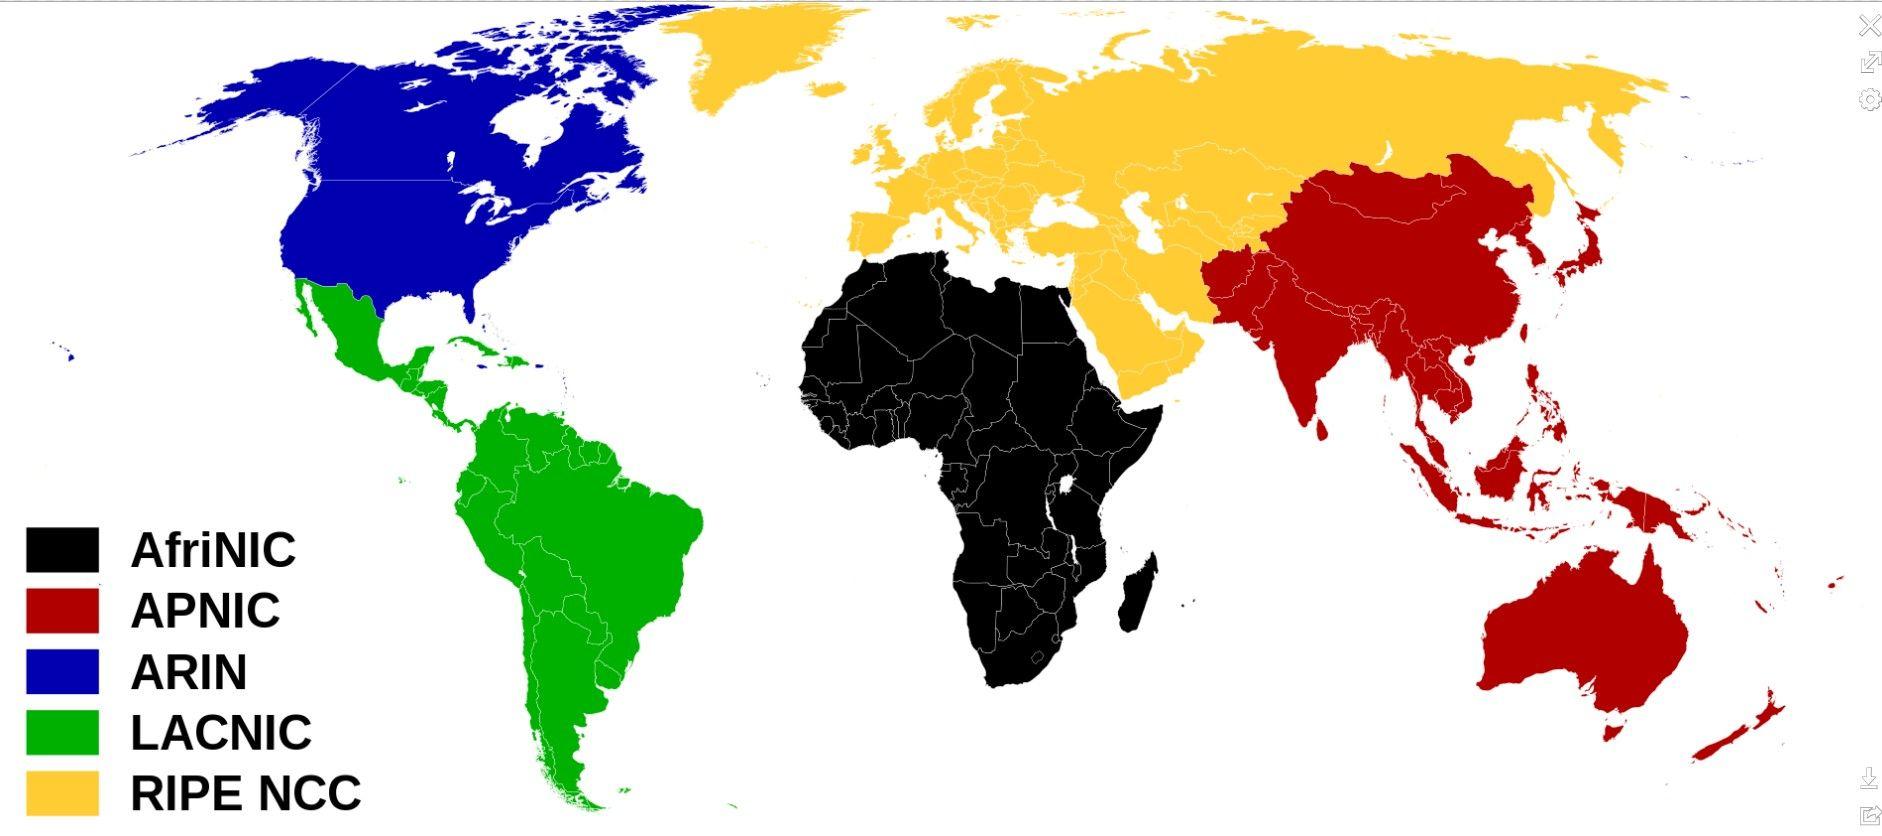 RIR (Regional Internet Registry)